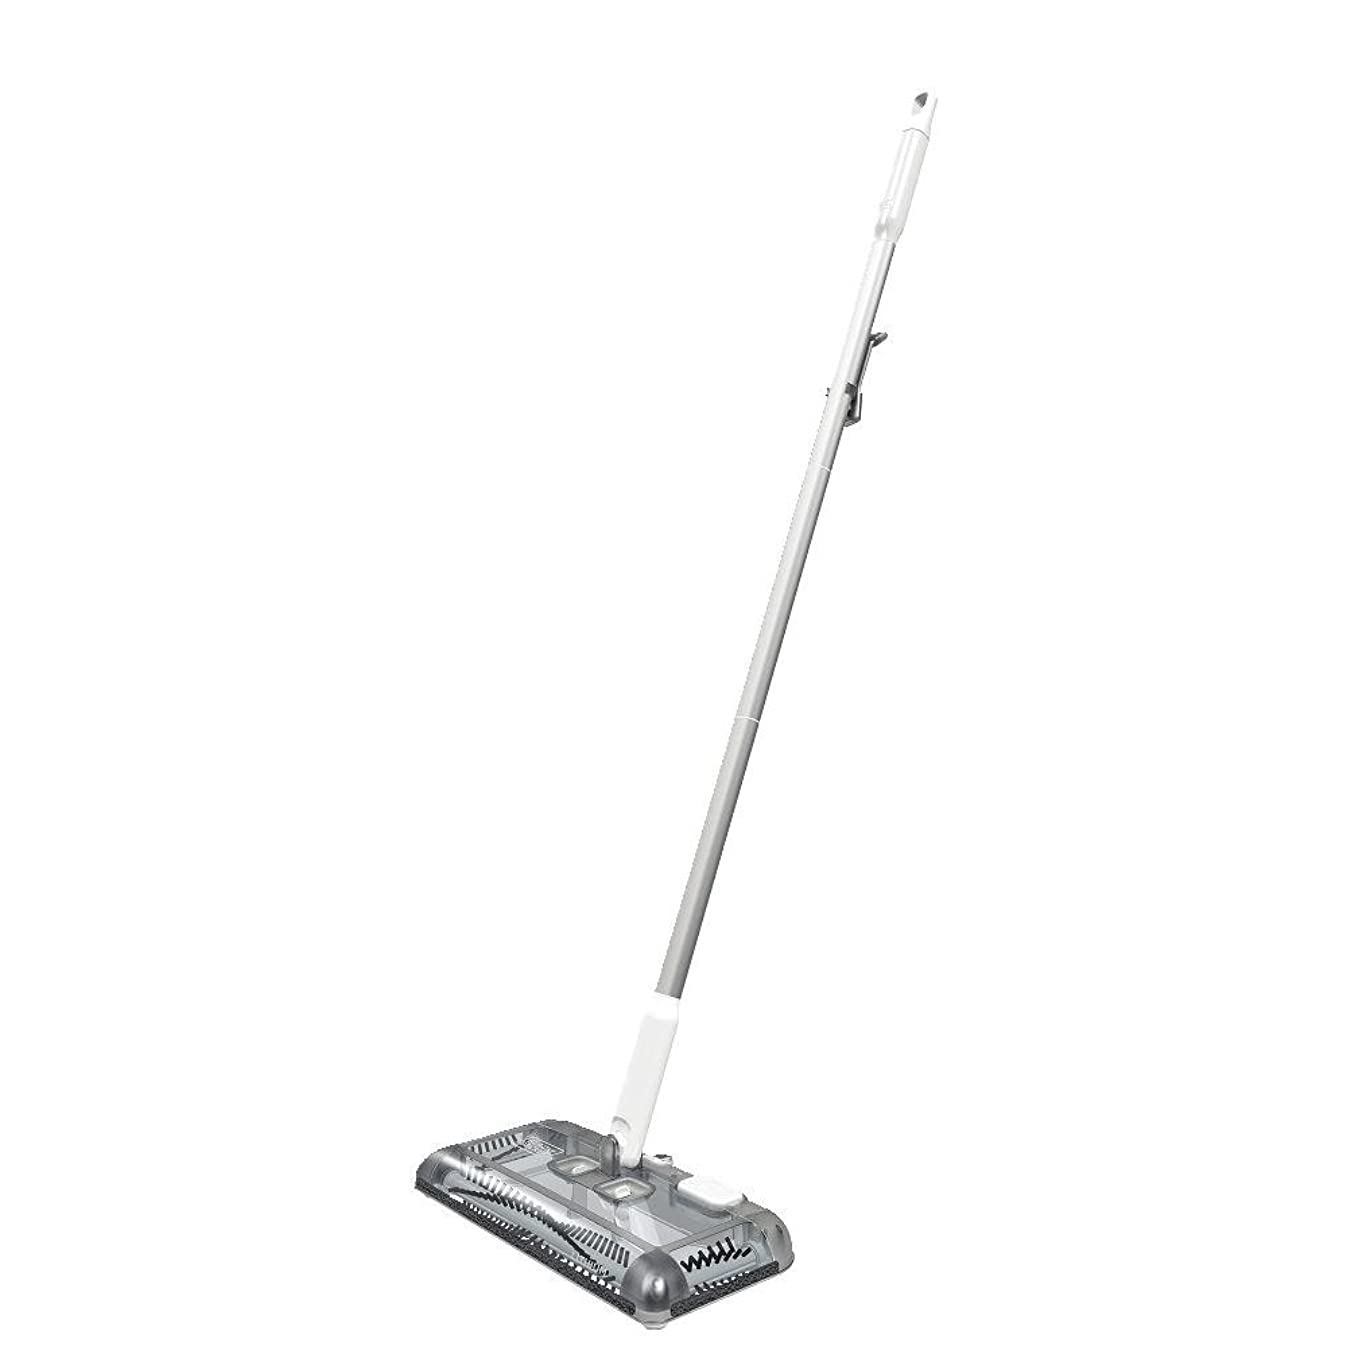 BLACK+DECKER HFS115J10 Lithium Floor Sweeper 50 Min Lithium Floor Sweeper, Powder White